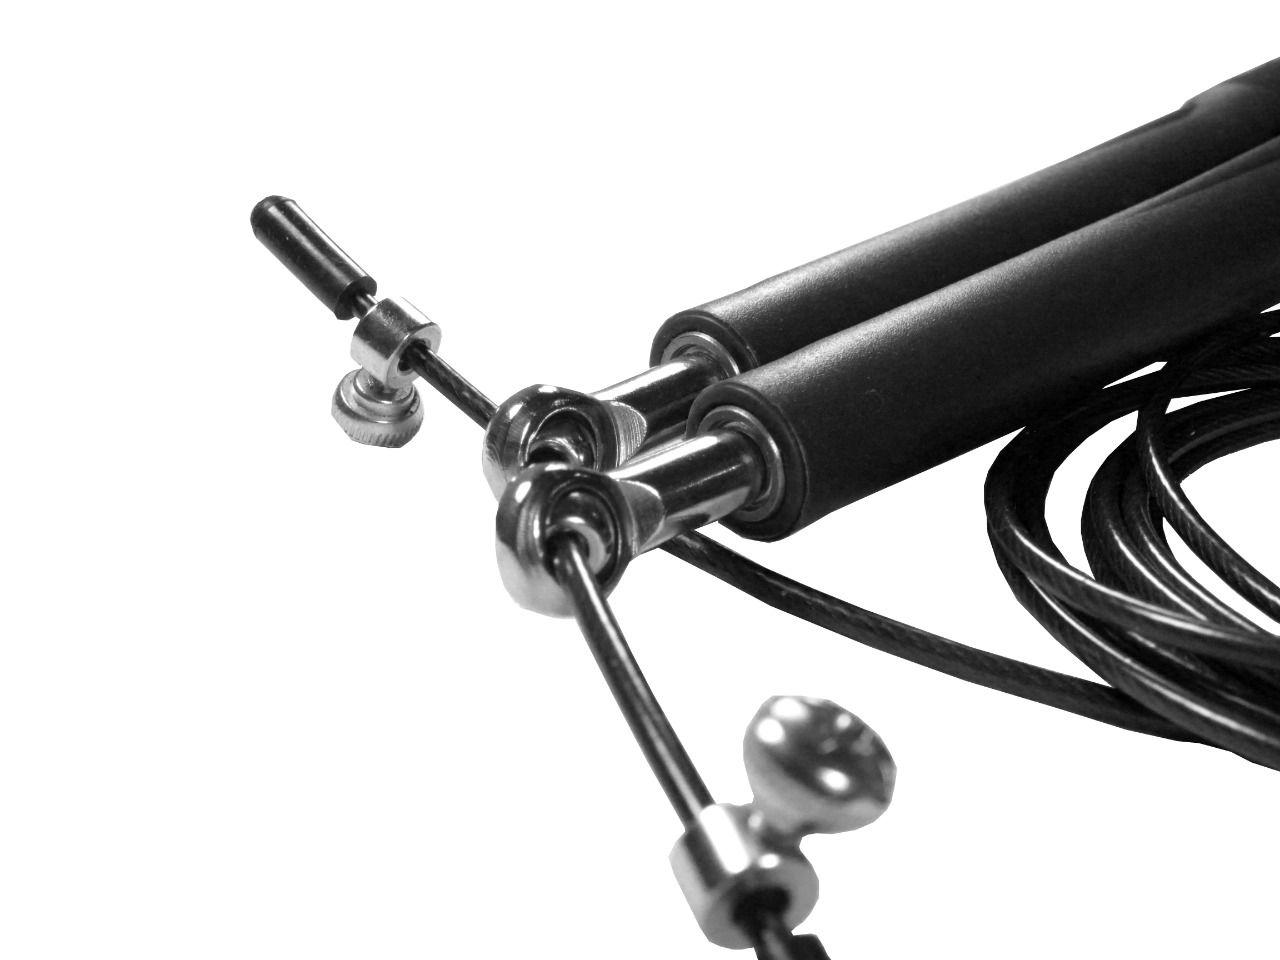 Corda De Pular Speed Rope 2 Rolamento / PVC Preta